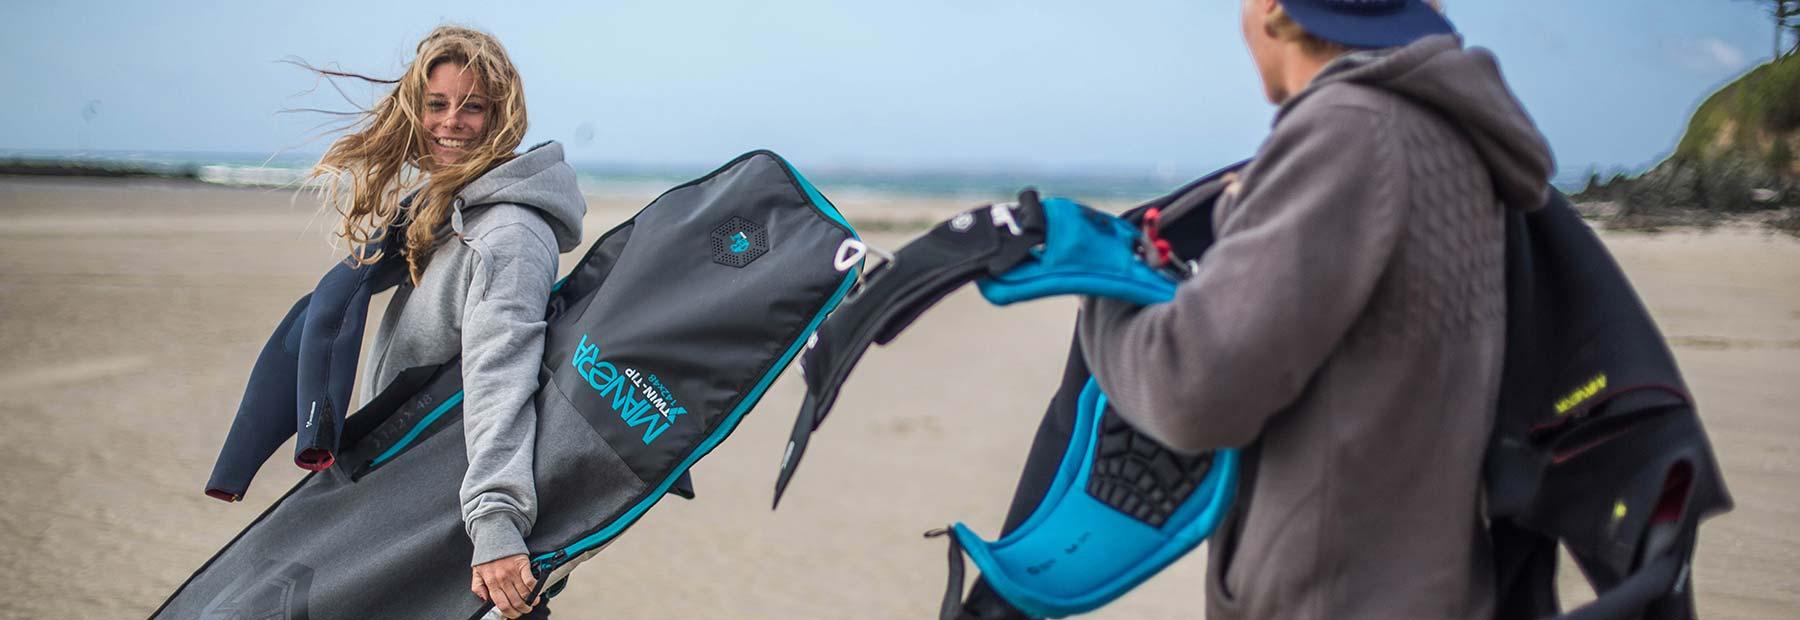 boardbags-banner1